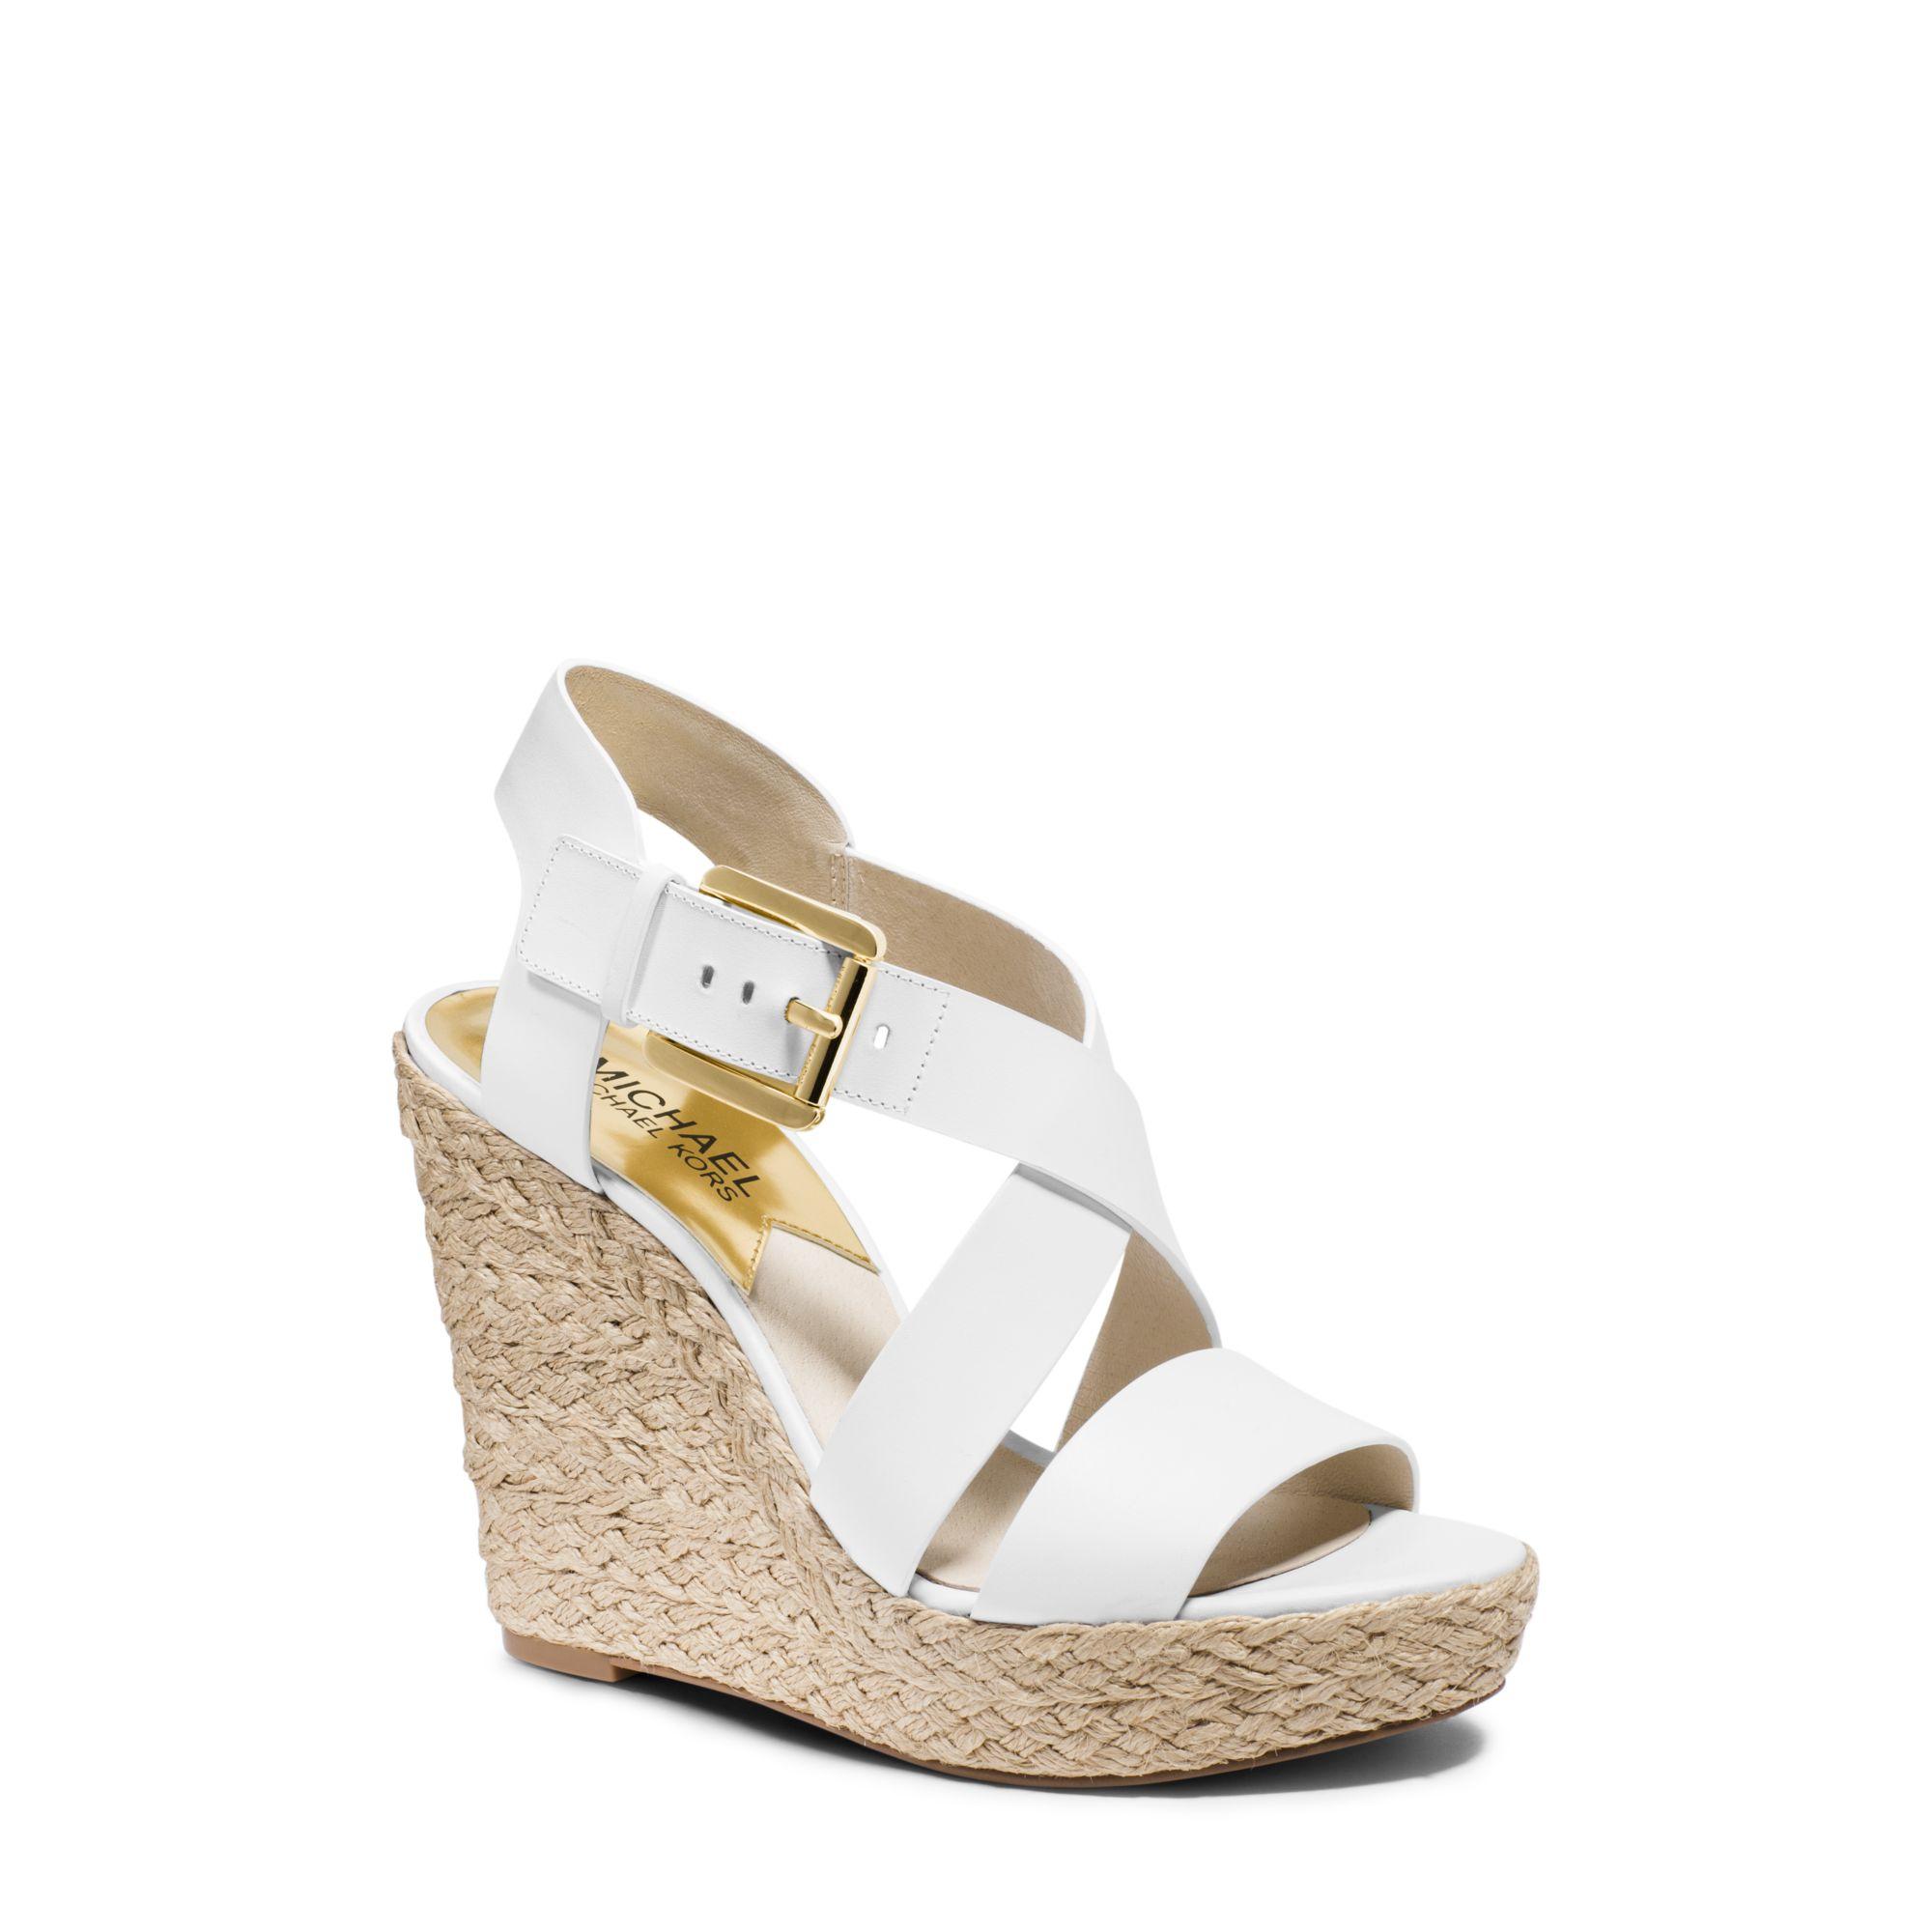 Michael Kors Giovanna Leather Espadrille Wedge Sandal In